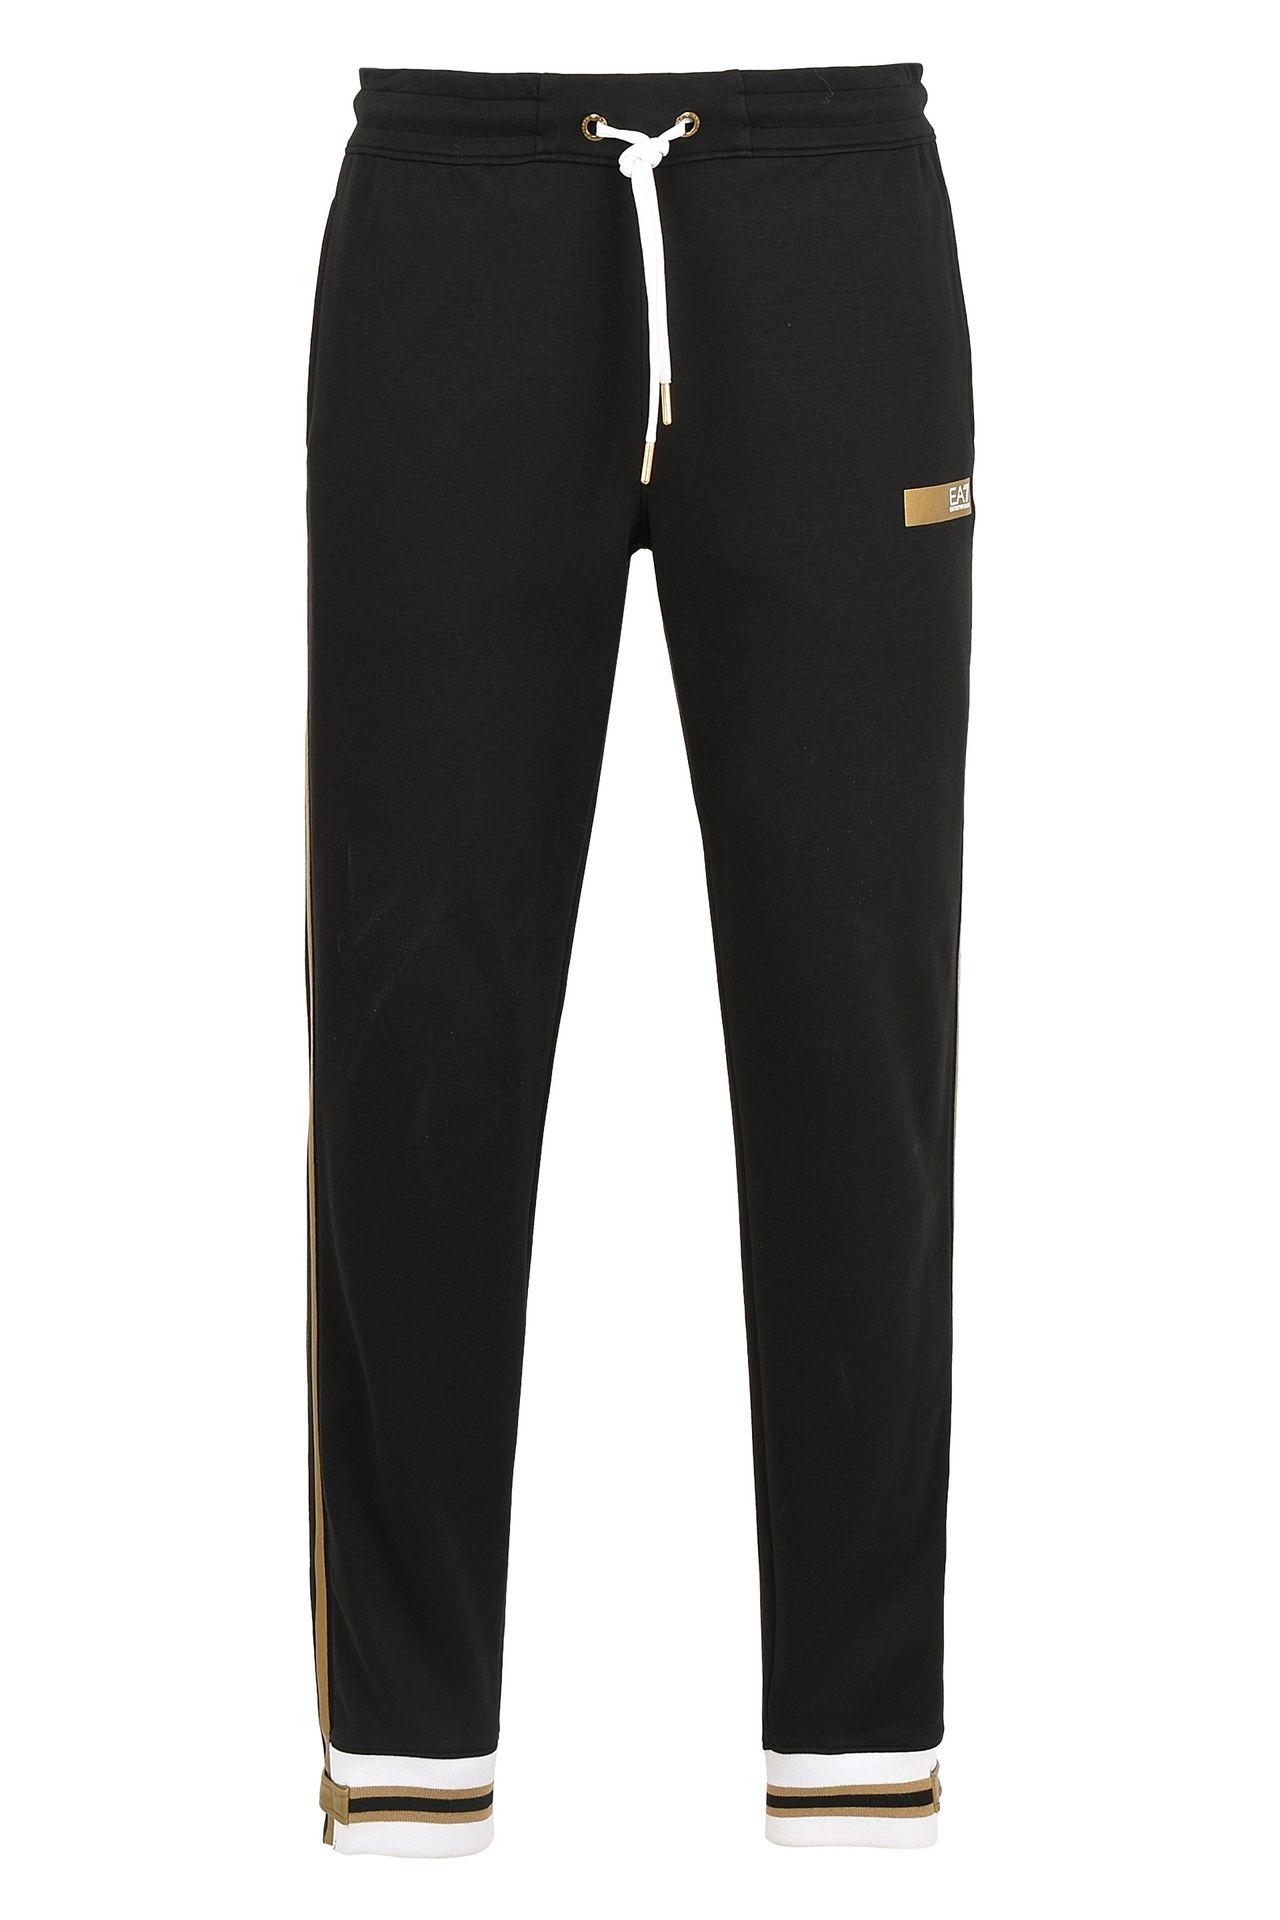 PANTALONI IN COTONE: Pants Uomo by Armani - 0